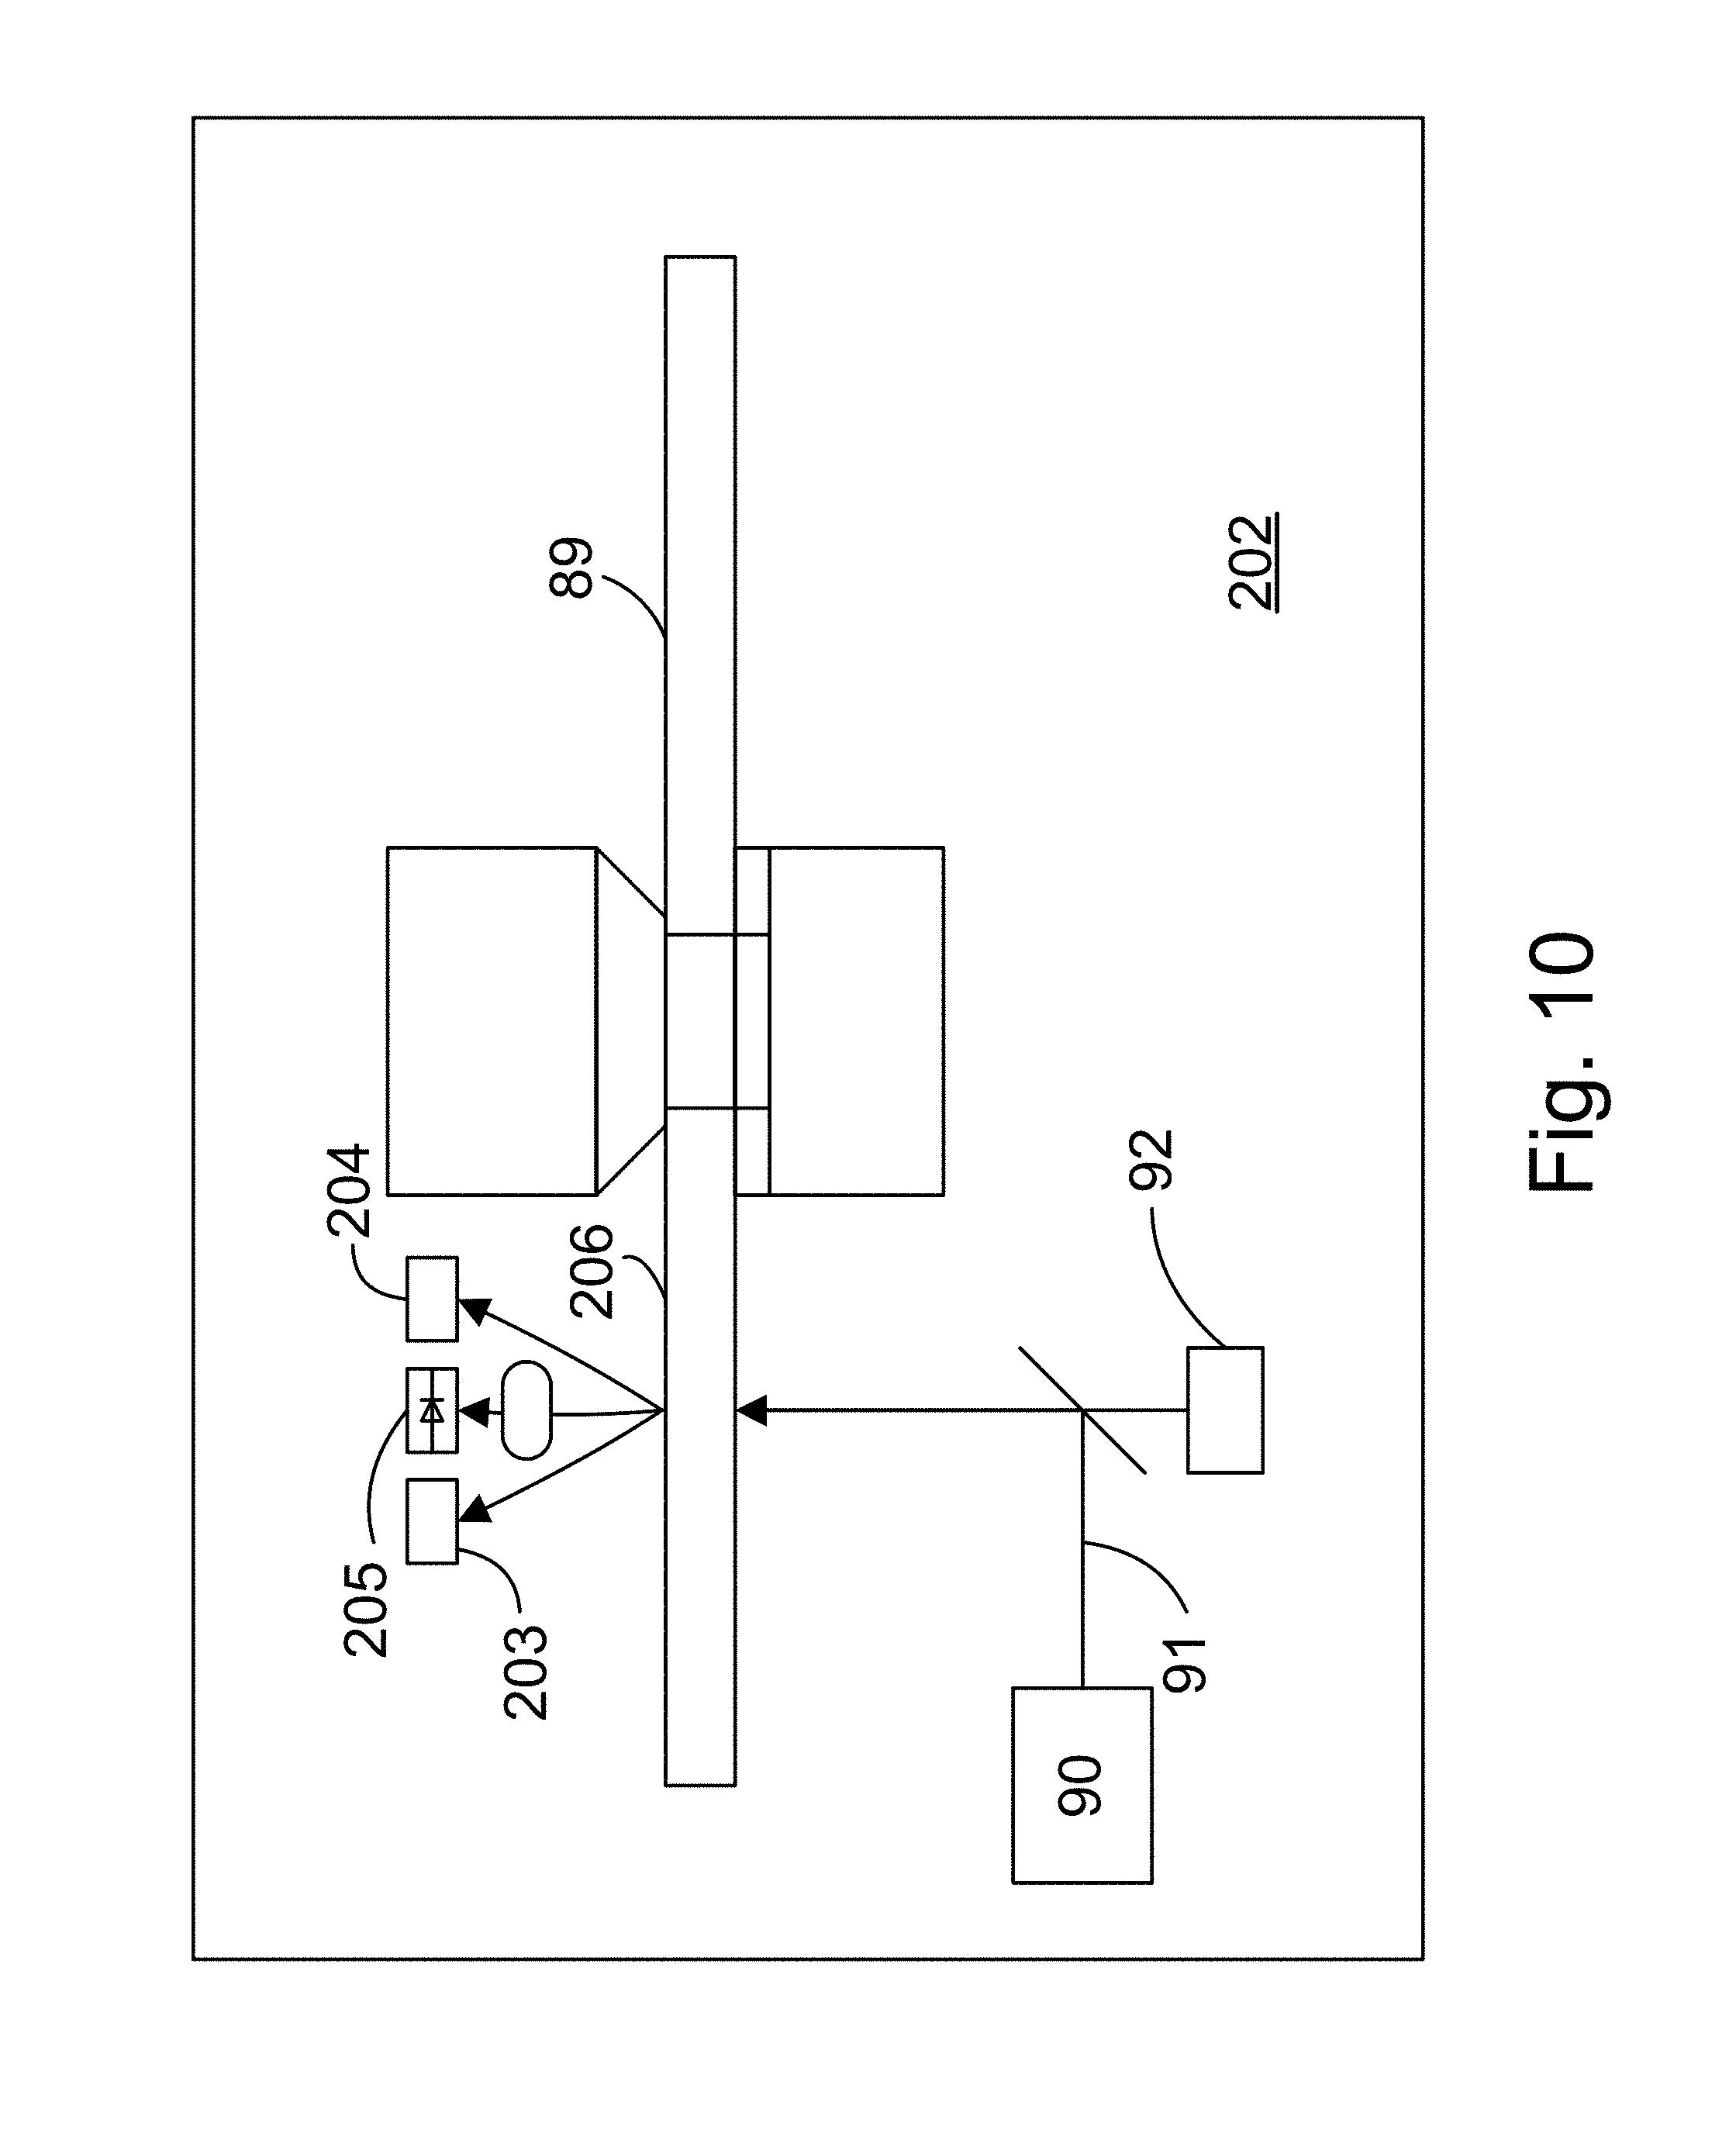 Patent Us 9811671 B1 Digitaltoanalog Converter Box Setup Basic Federal Communications 0 Petitions